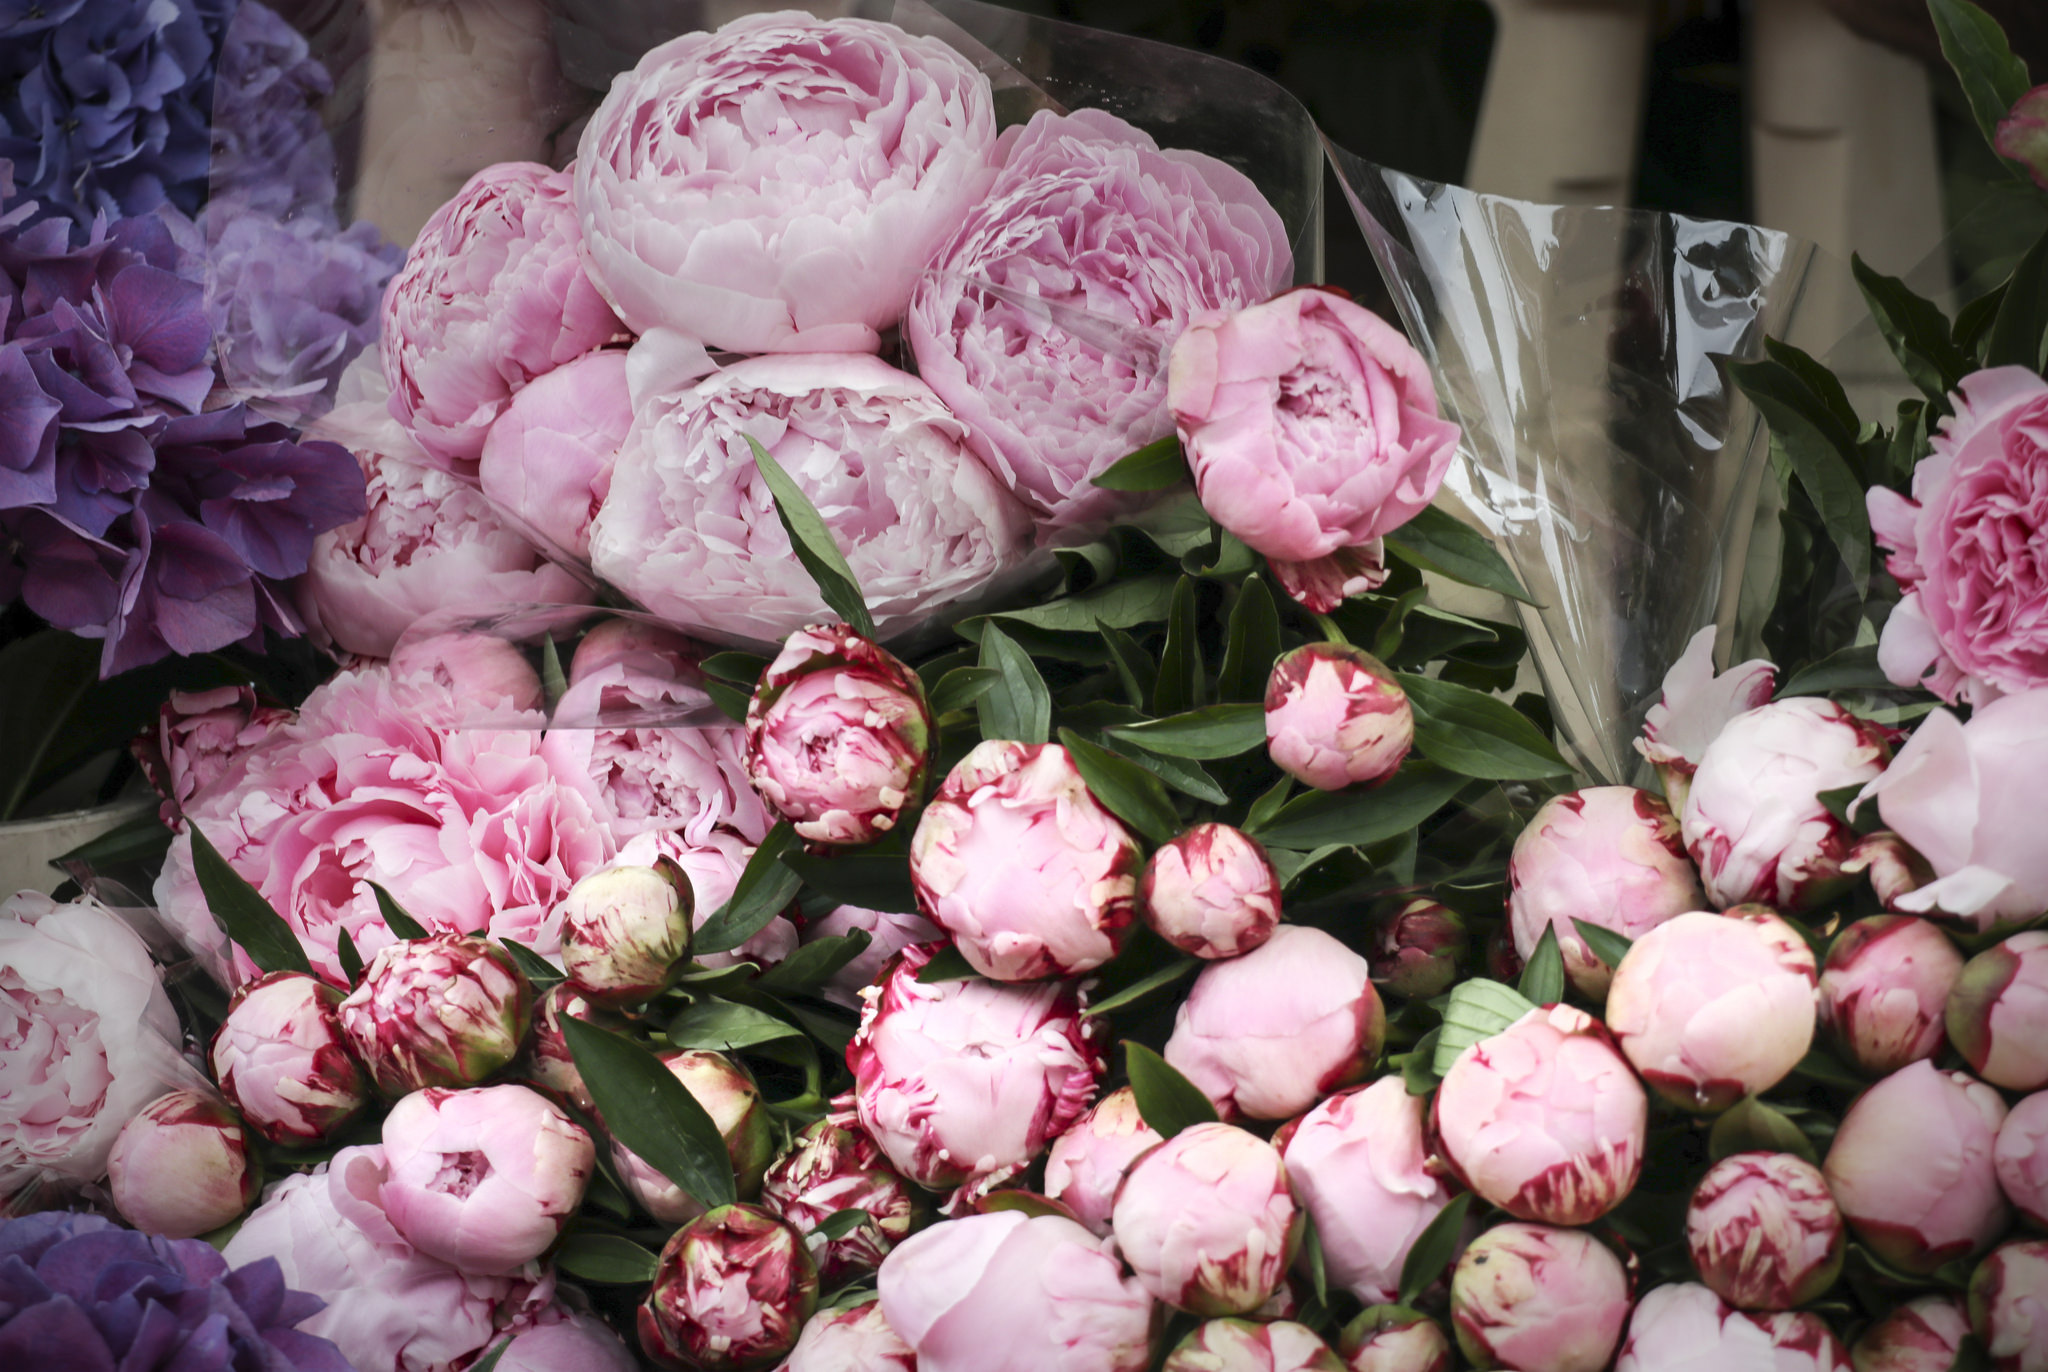 Columbia Road flower market shot by Kotomi